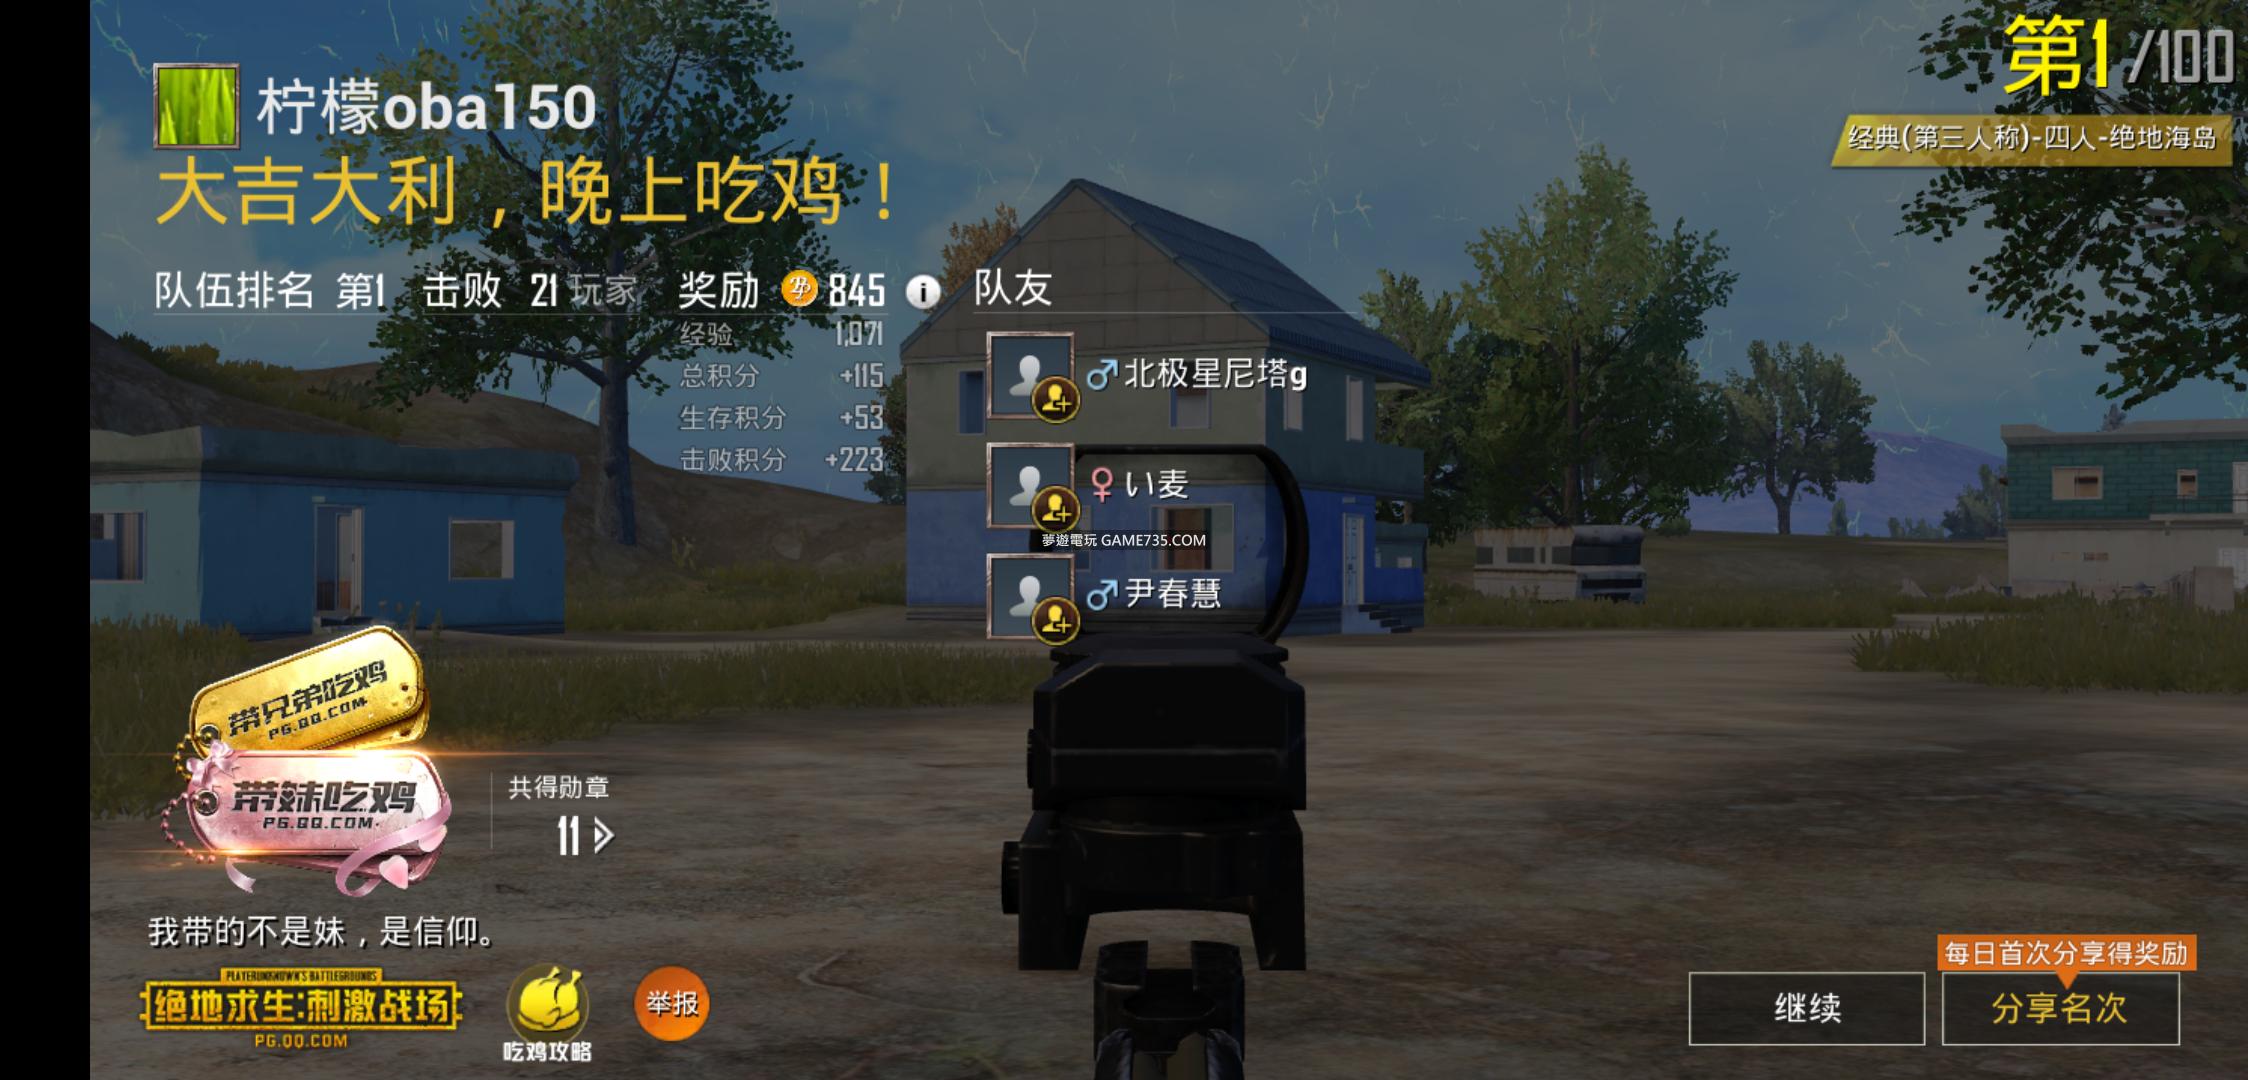 5be3a32d0e652.jpg